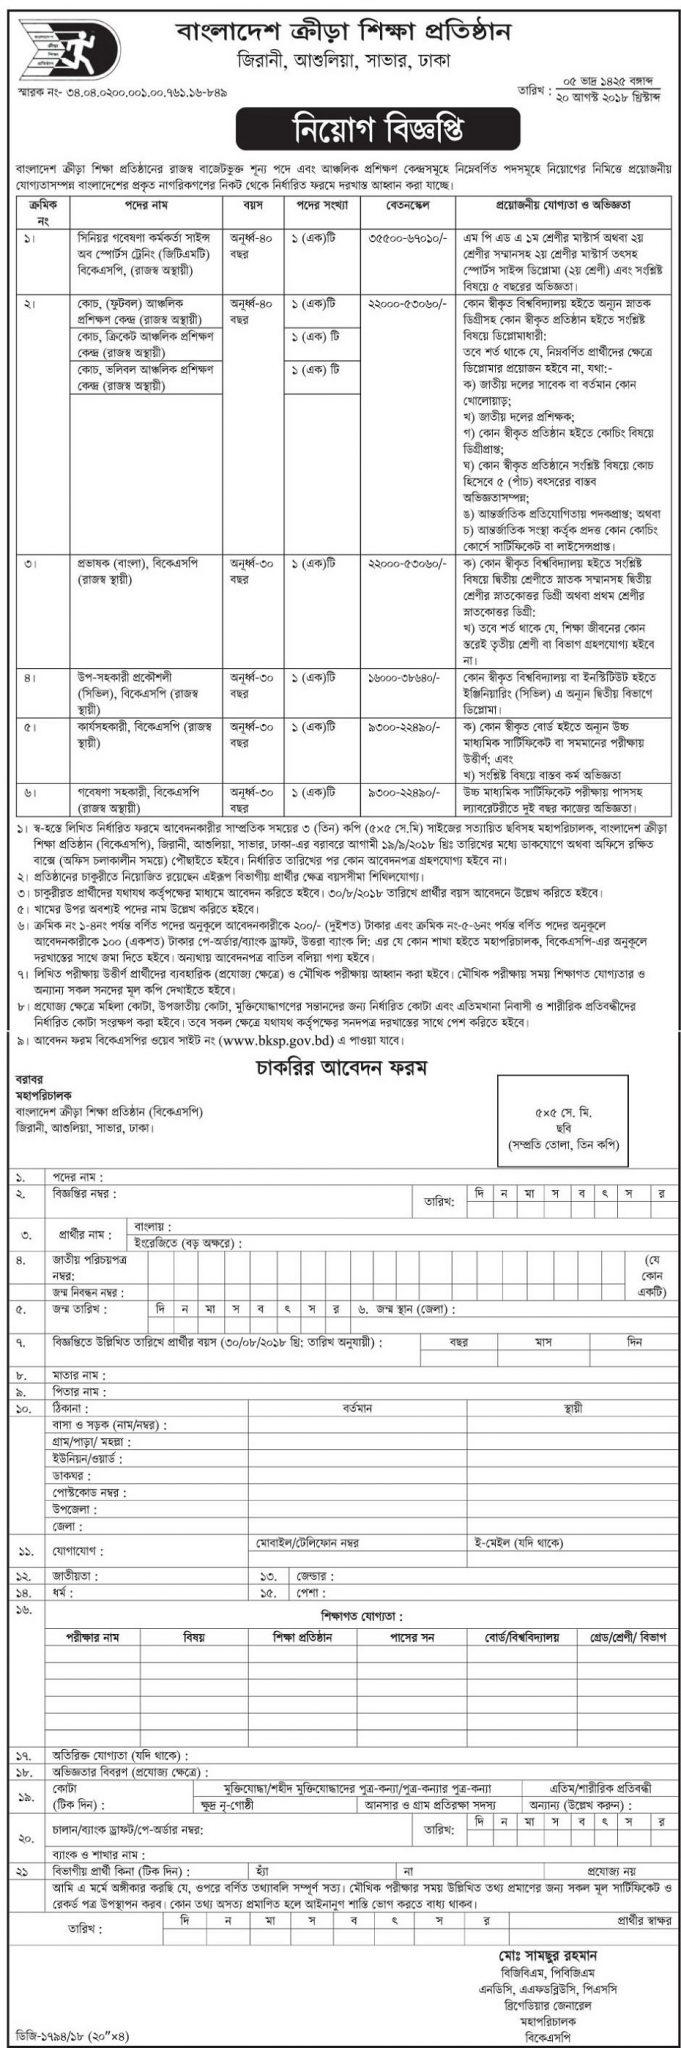 Bangladesh Krira Shikkha Protisthan (BKSP) Job Circular 2018